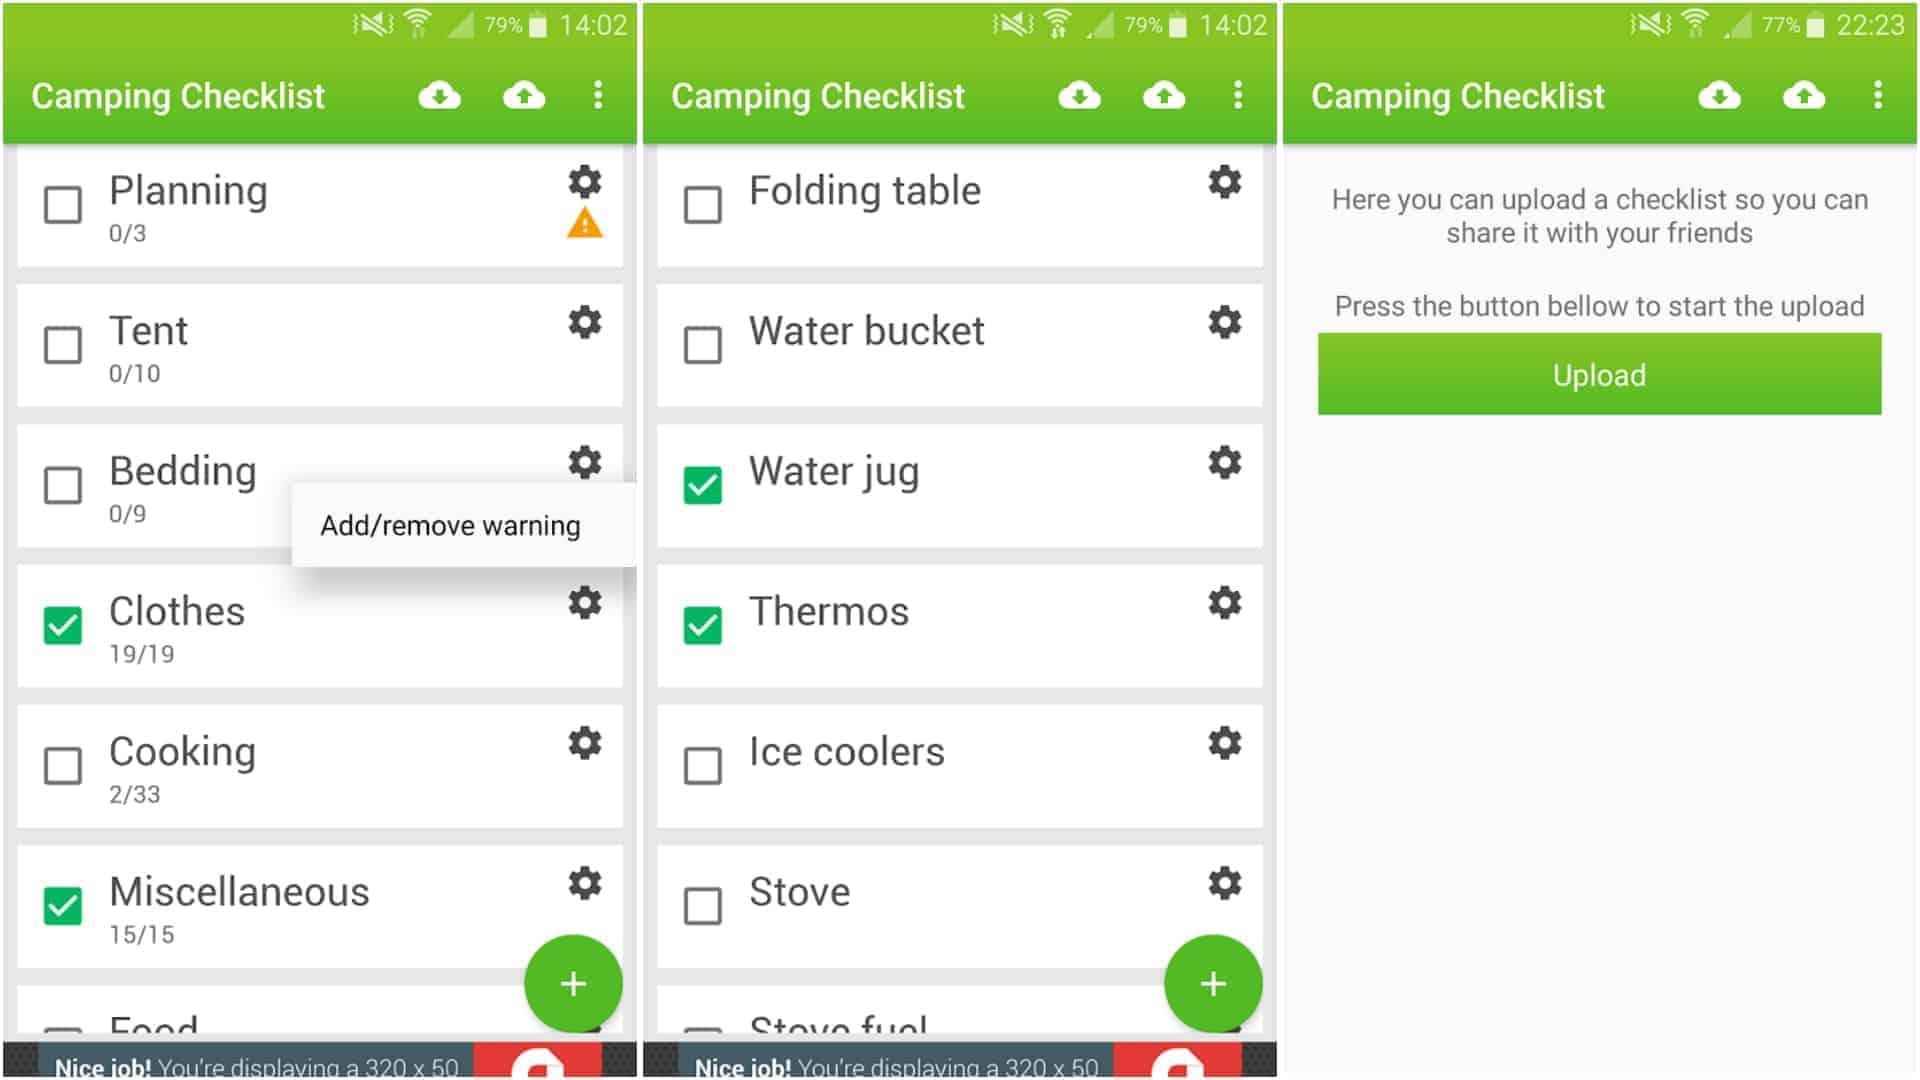 Image de l'application Camping Checklist Juin 2020